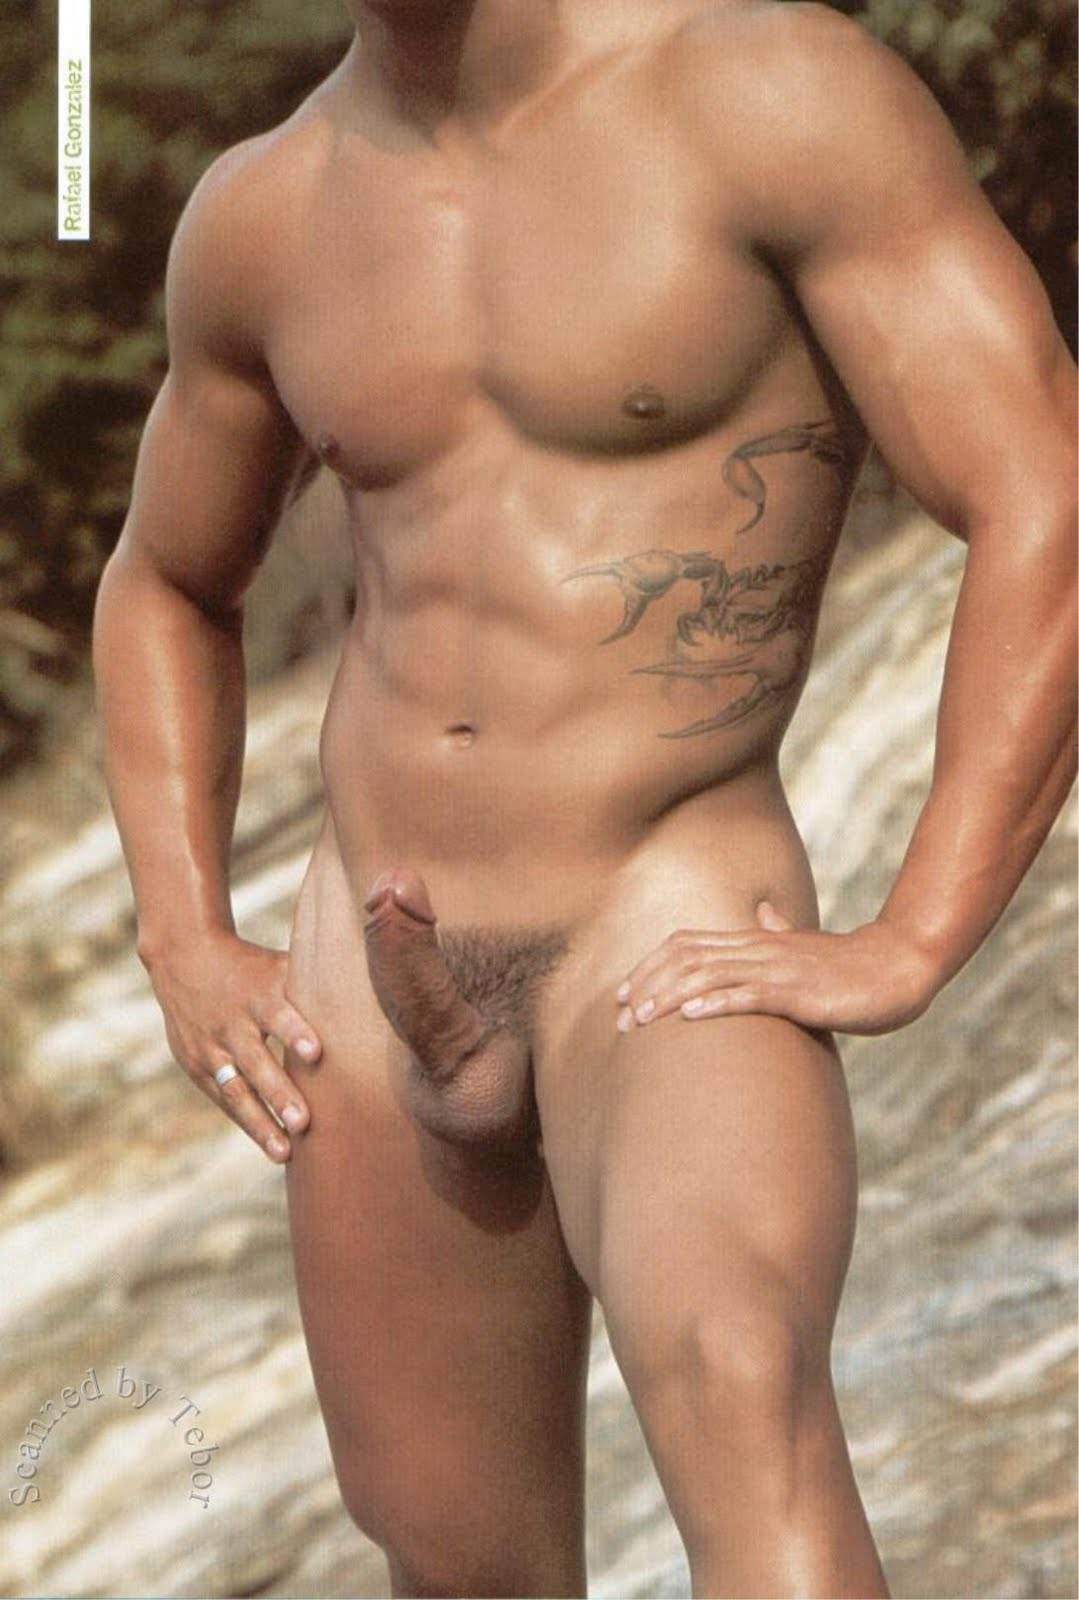 rafael gonzalez naked gallery 23184 my hotz pic